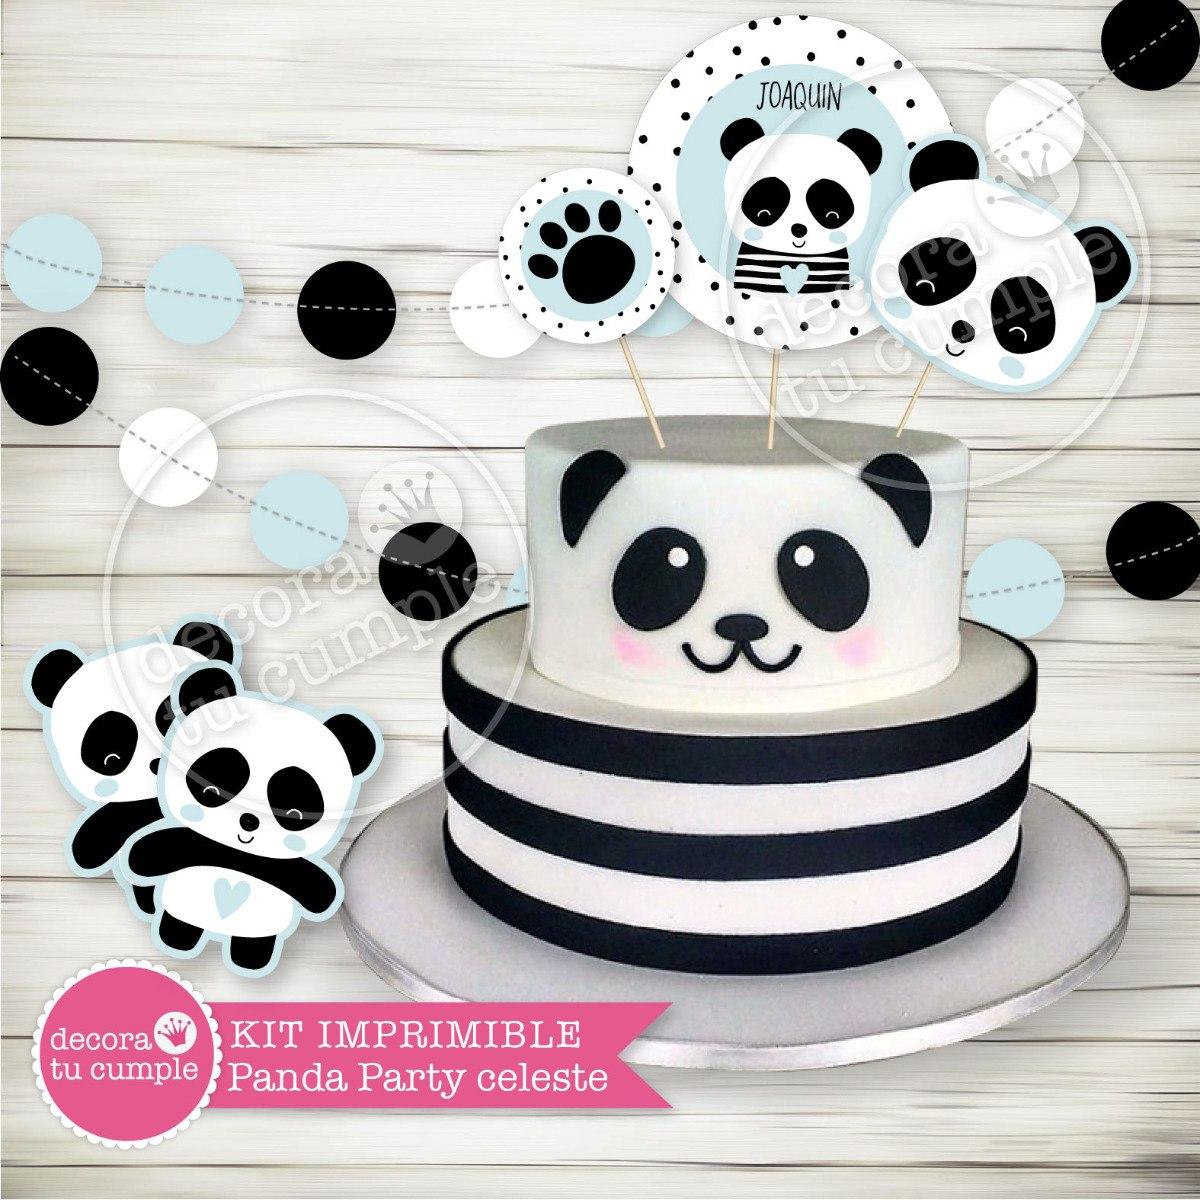 Kit Imprimible Osito Panda Candy Bar Baby Shower Cumpleanos 380